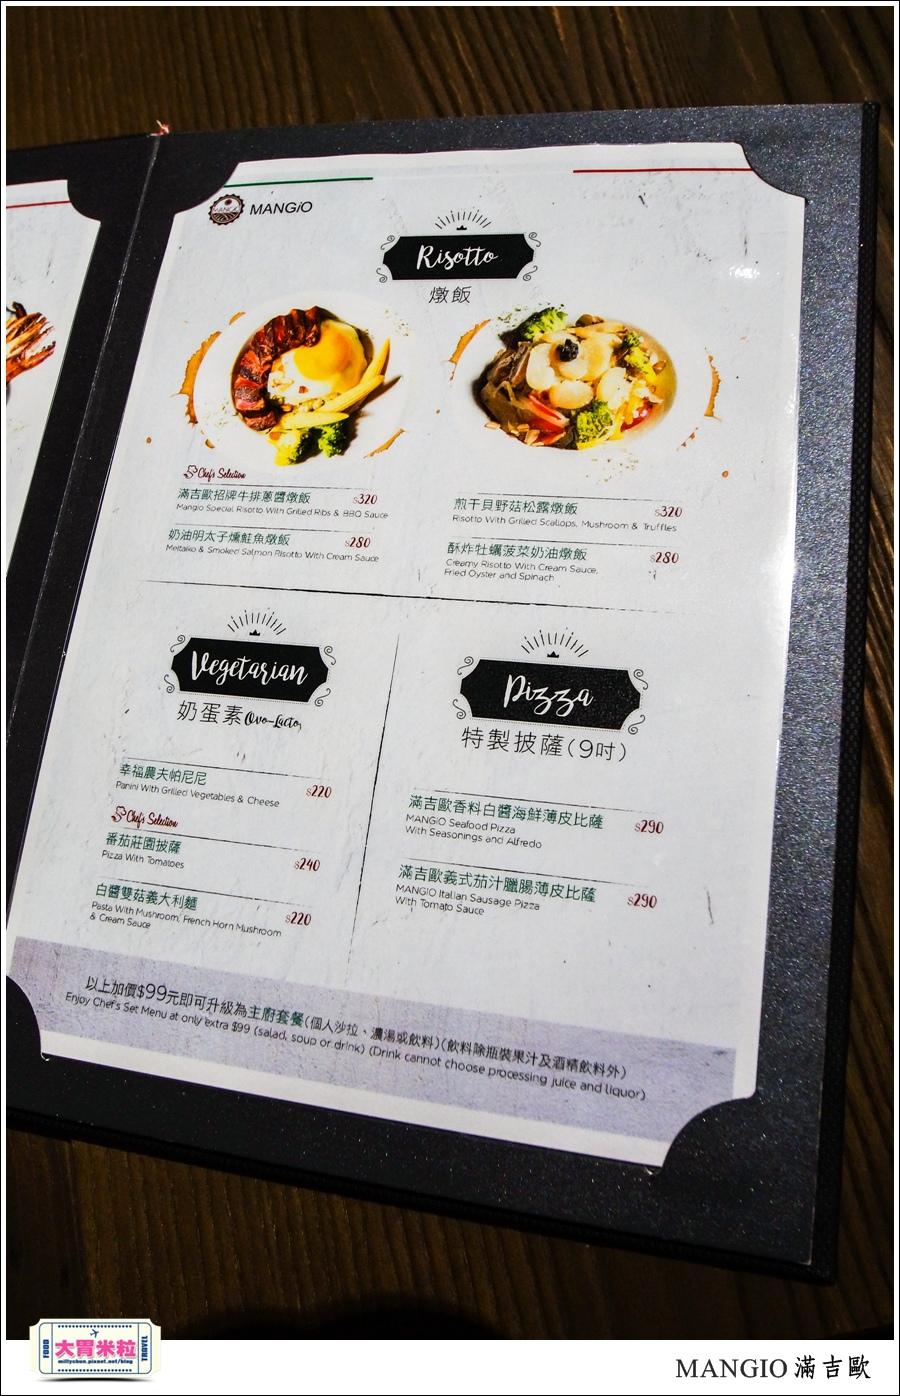 MANGiO Bistro 滿吉歐義式樂活餐酒館@台北餐酒館推薦@大胃米粒0062.jpg